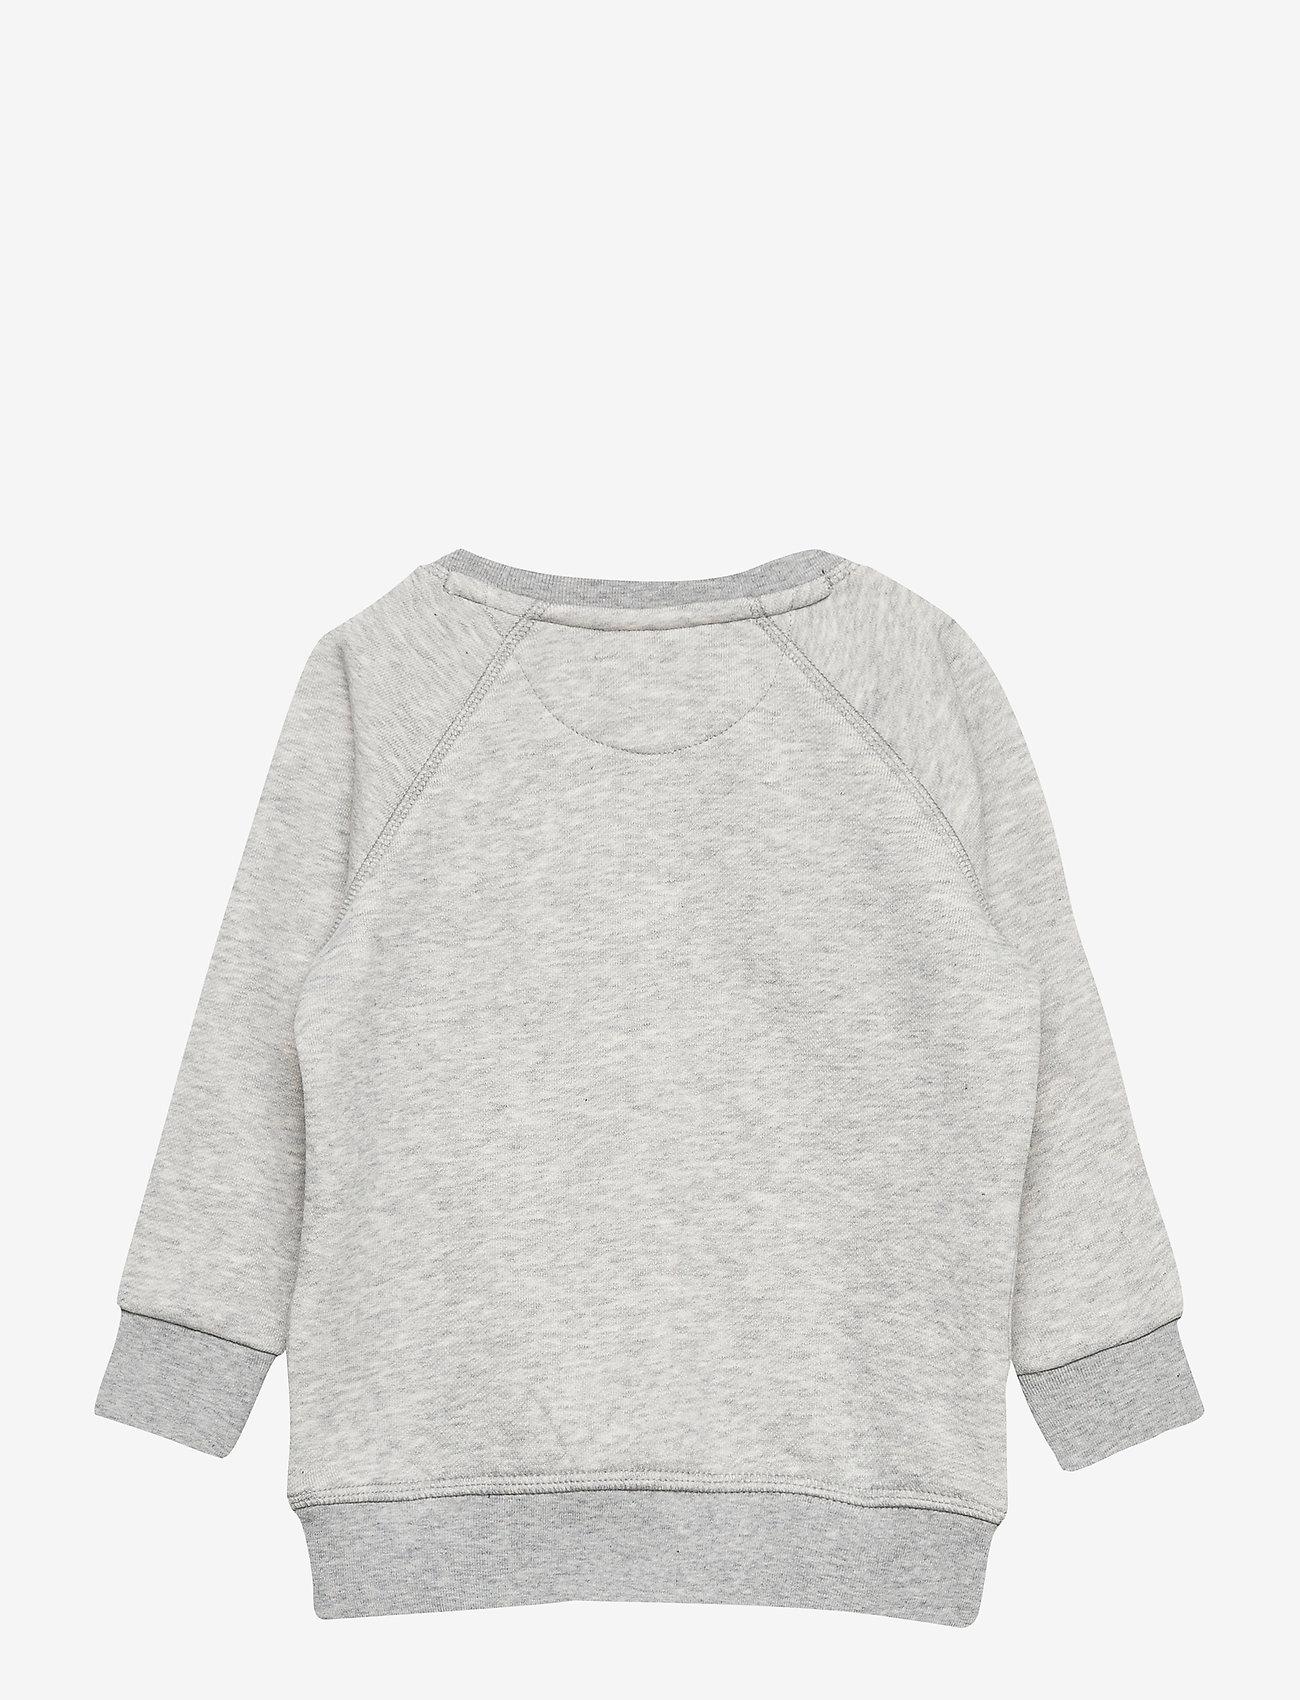 GANT - GANT LOCK-UP SWEAT C-NECK - sweatshirts - light grey melange - 1